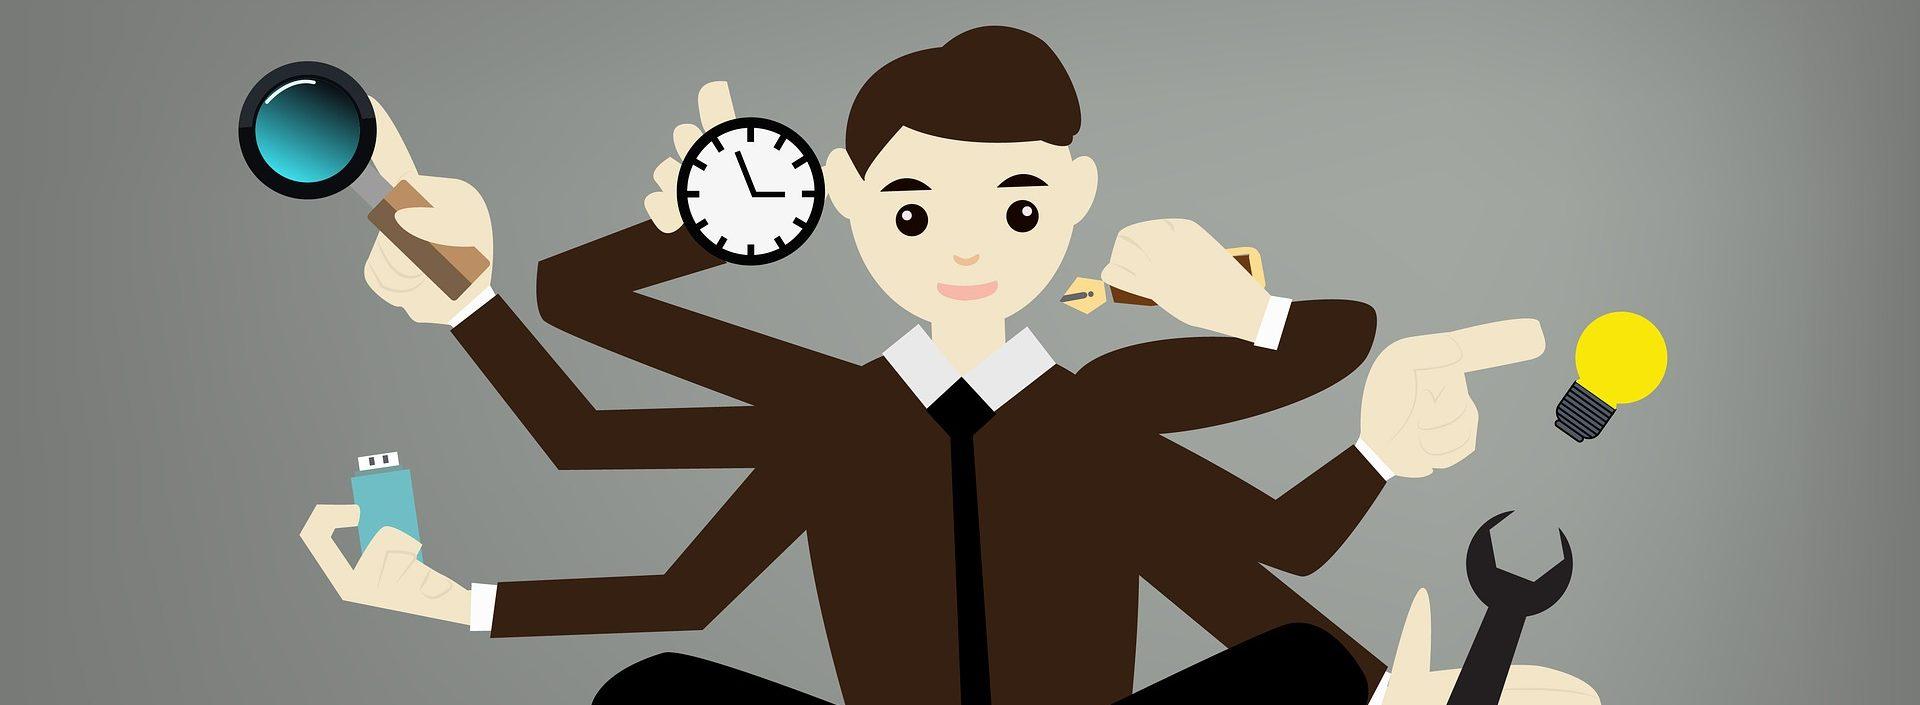 The Myth About Multitasking